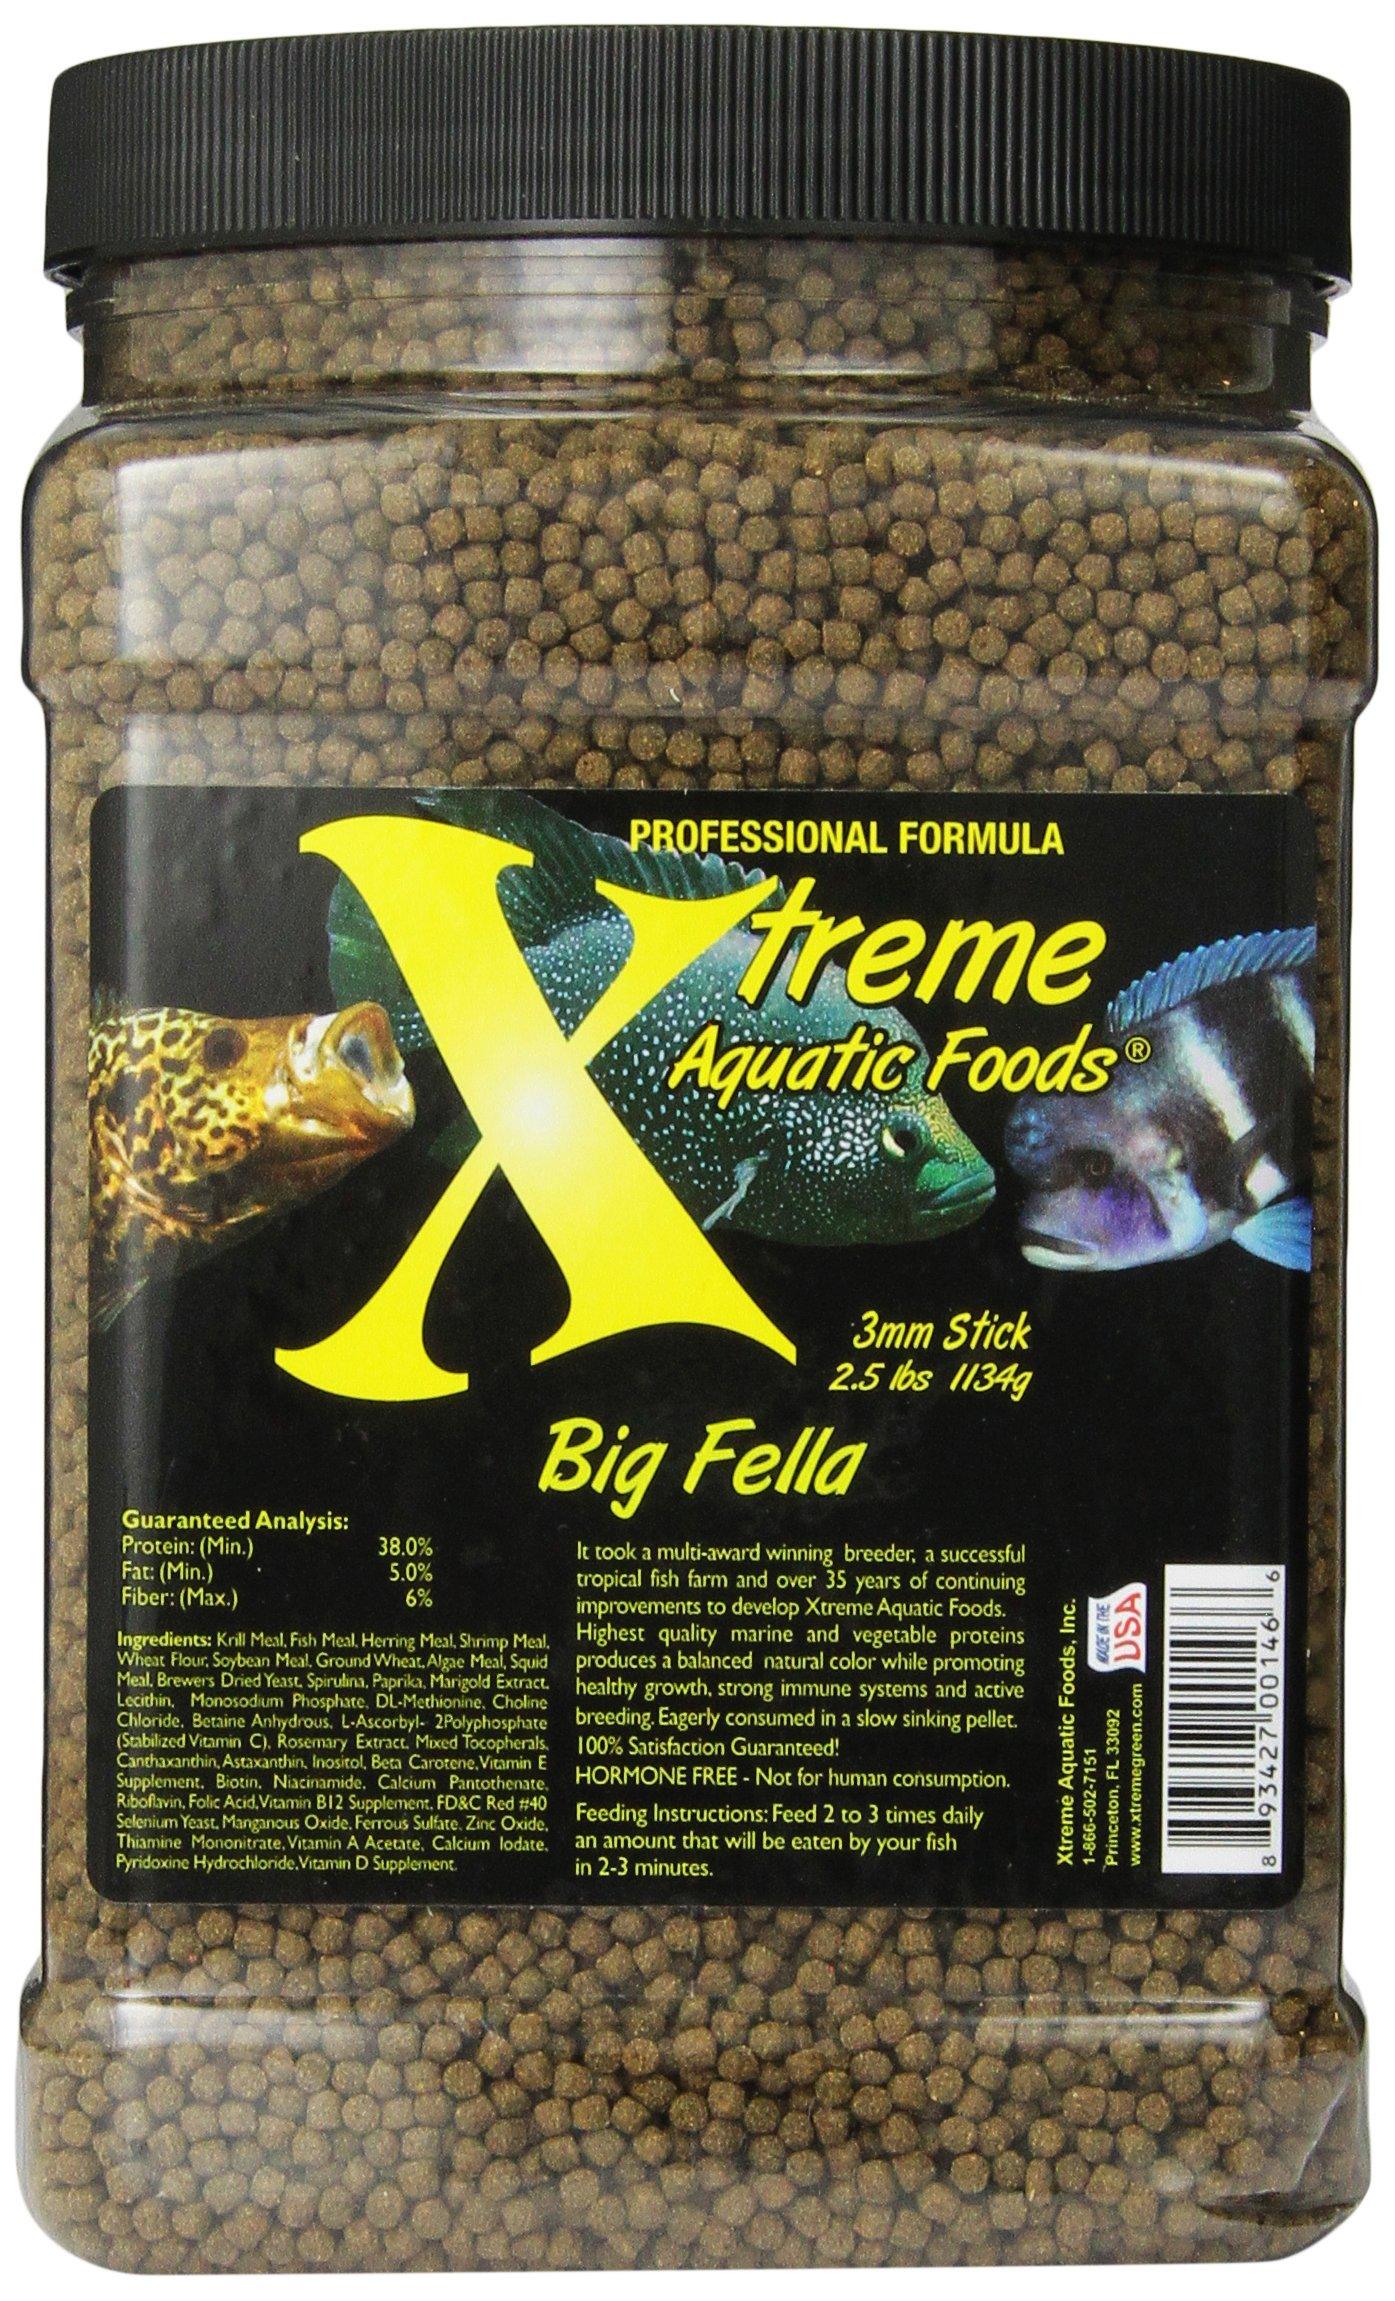 Xtreme Aquatic Foods 2146-F Big Fella Stick Fish Food by Xtreme Aquatic Foods